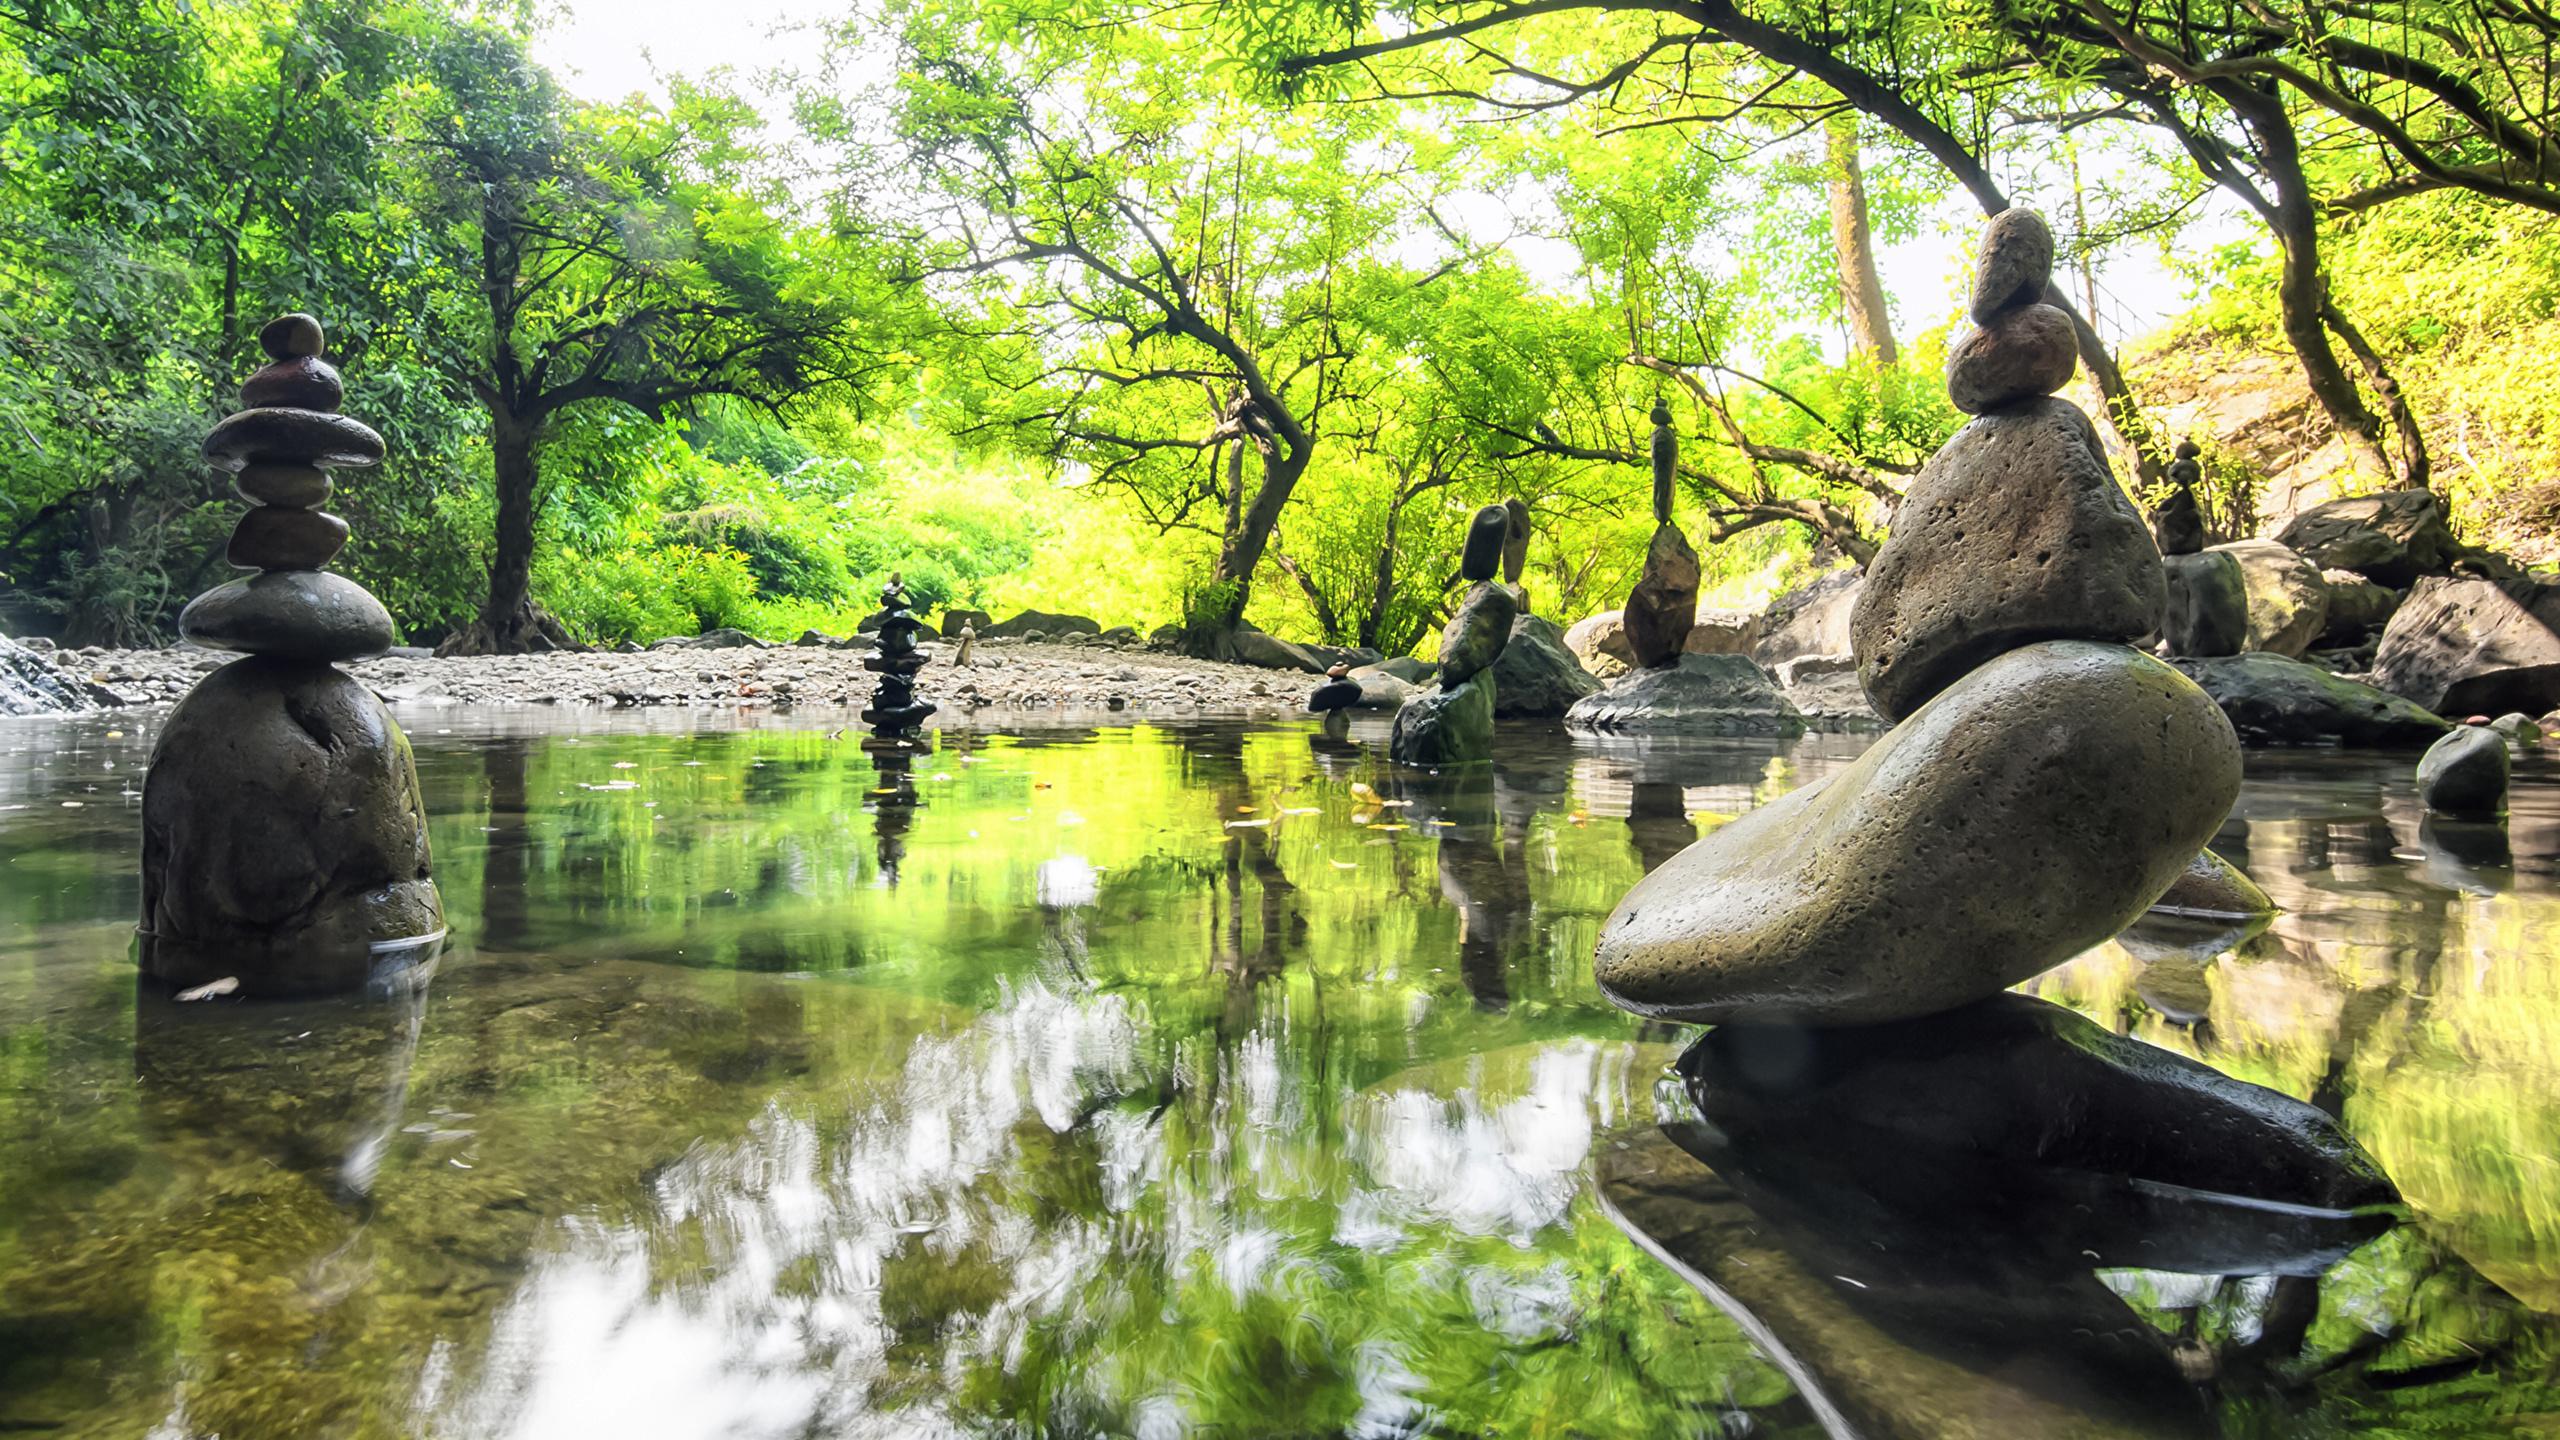 Картинка Природа весенние Пруд Парки Камни Скульптуры 2560x1440 Весна парк Камень